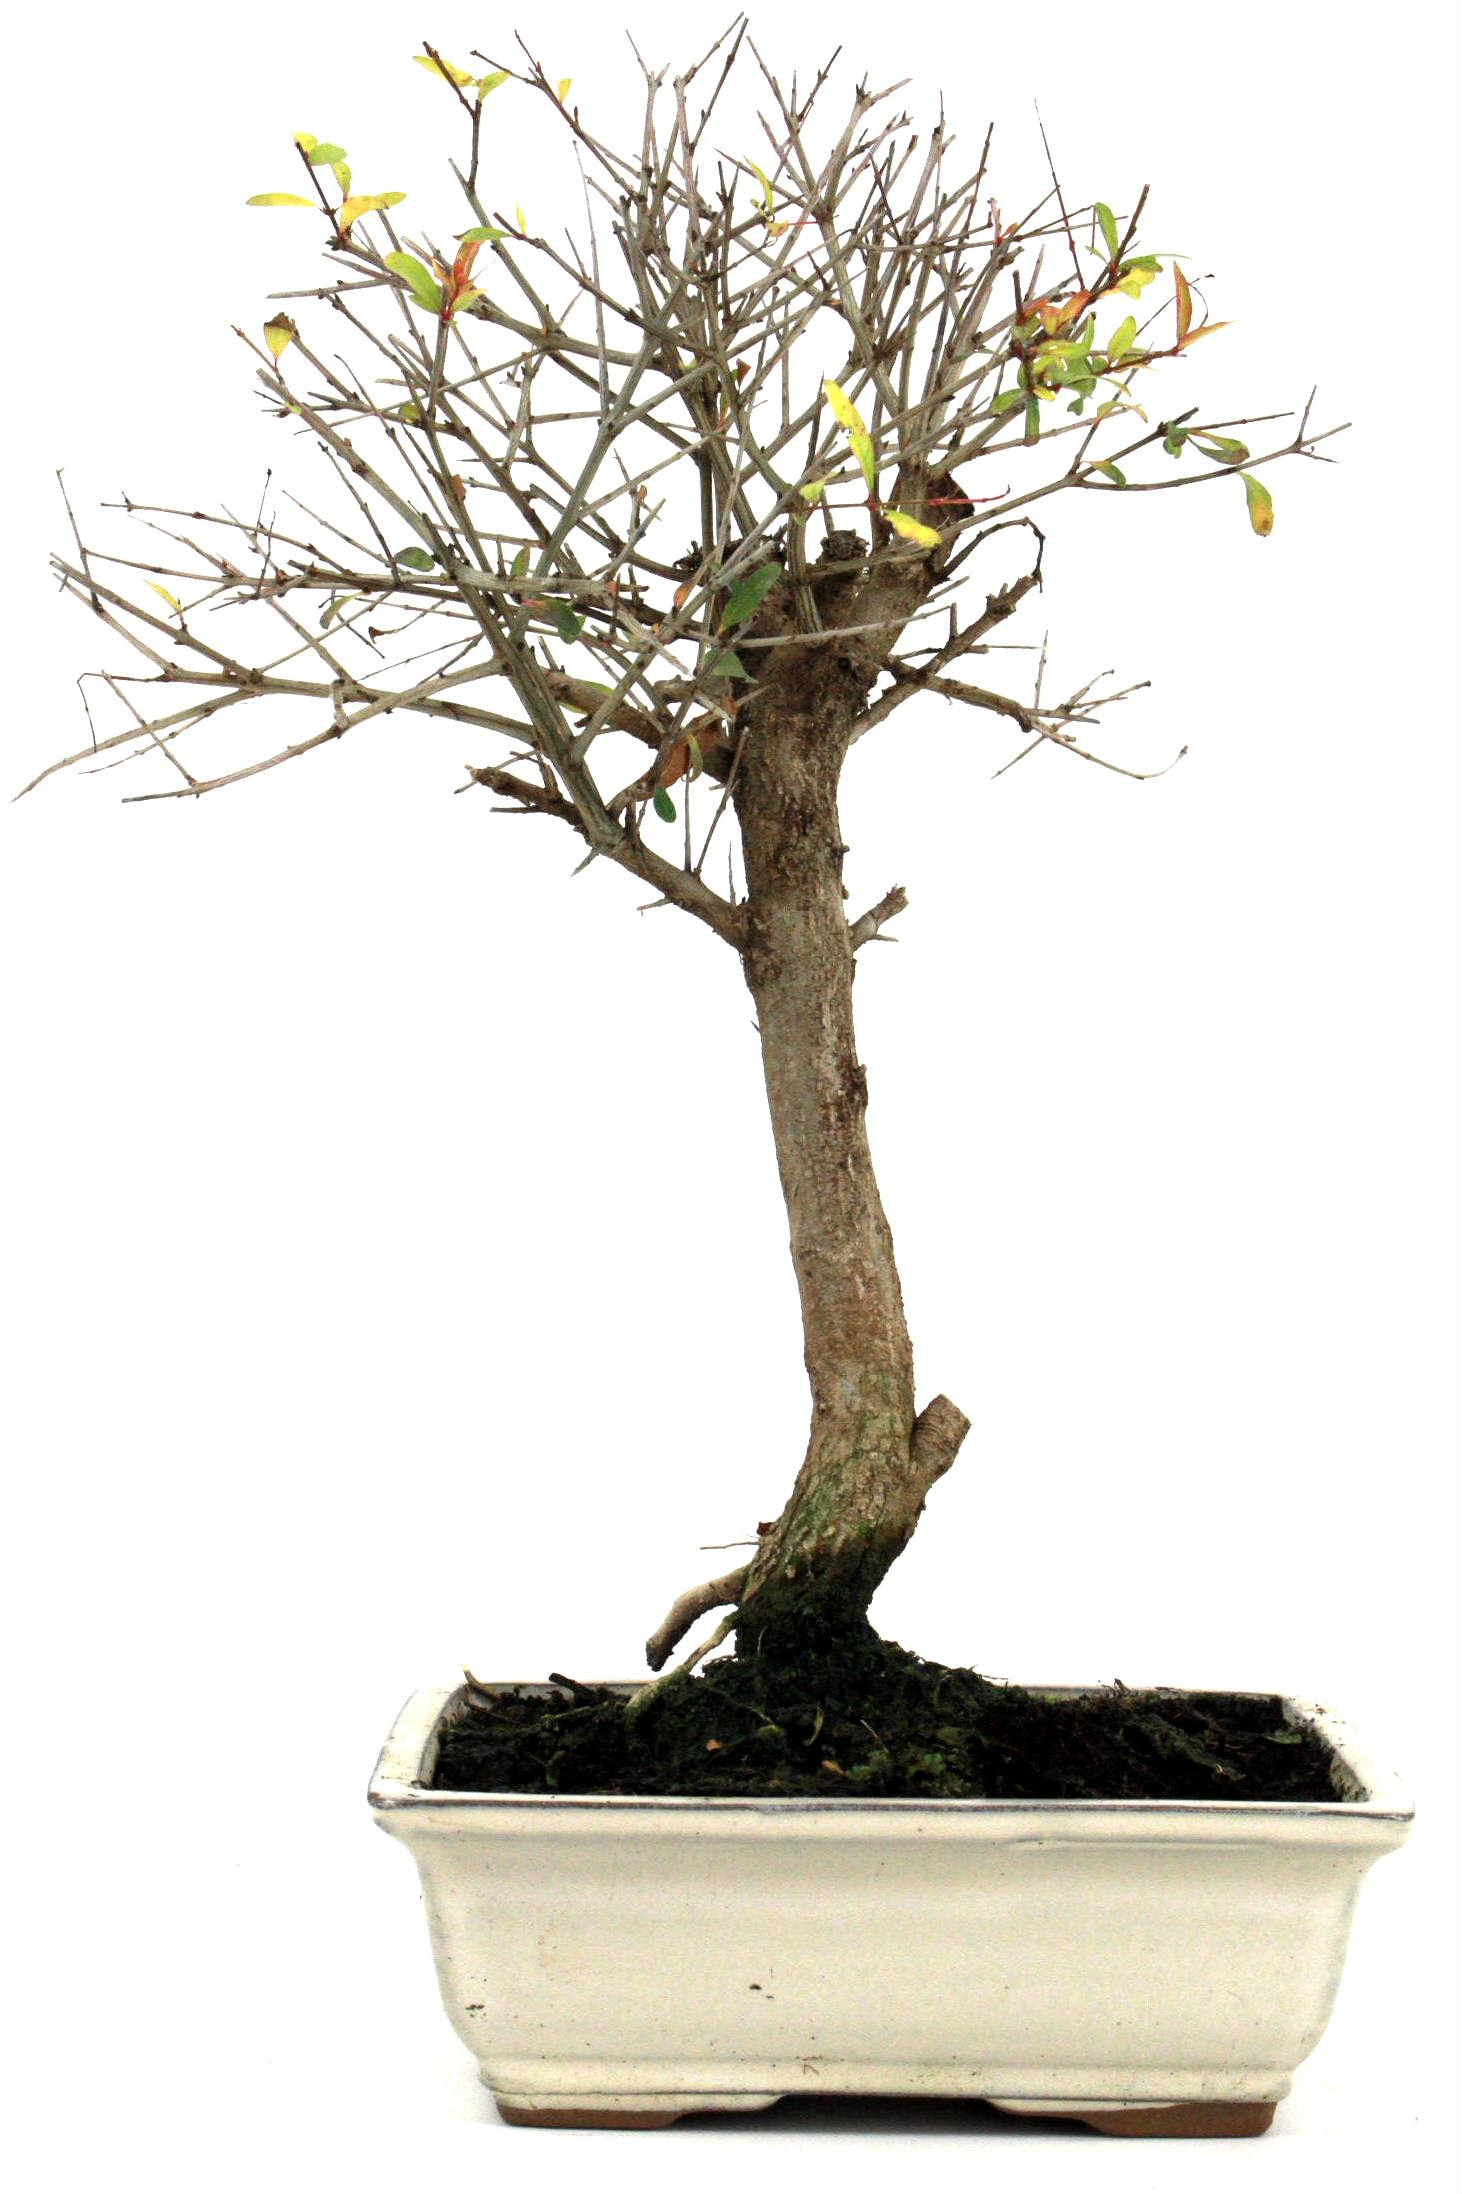 bonsai granatapfel 35 40 cm 1915 bei oyaki bonsai kaufen. Black Bedroom Furniture Sets. Home Design Ideas